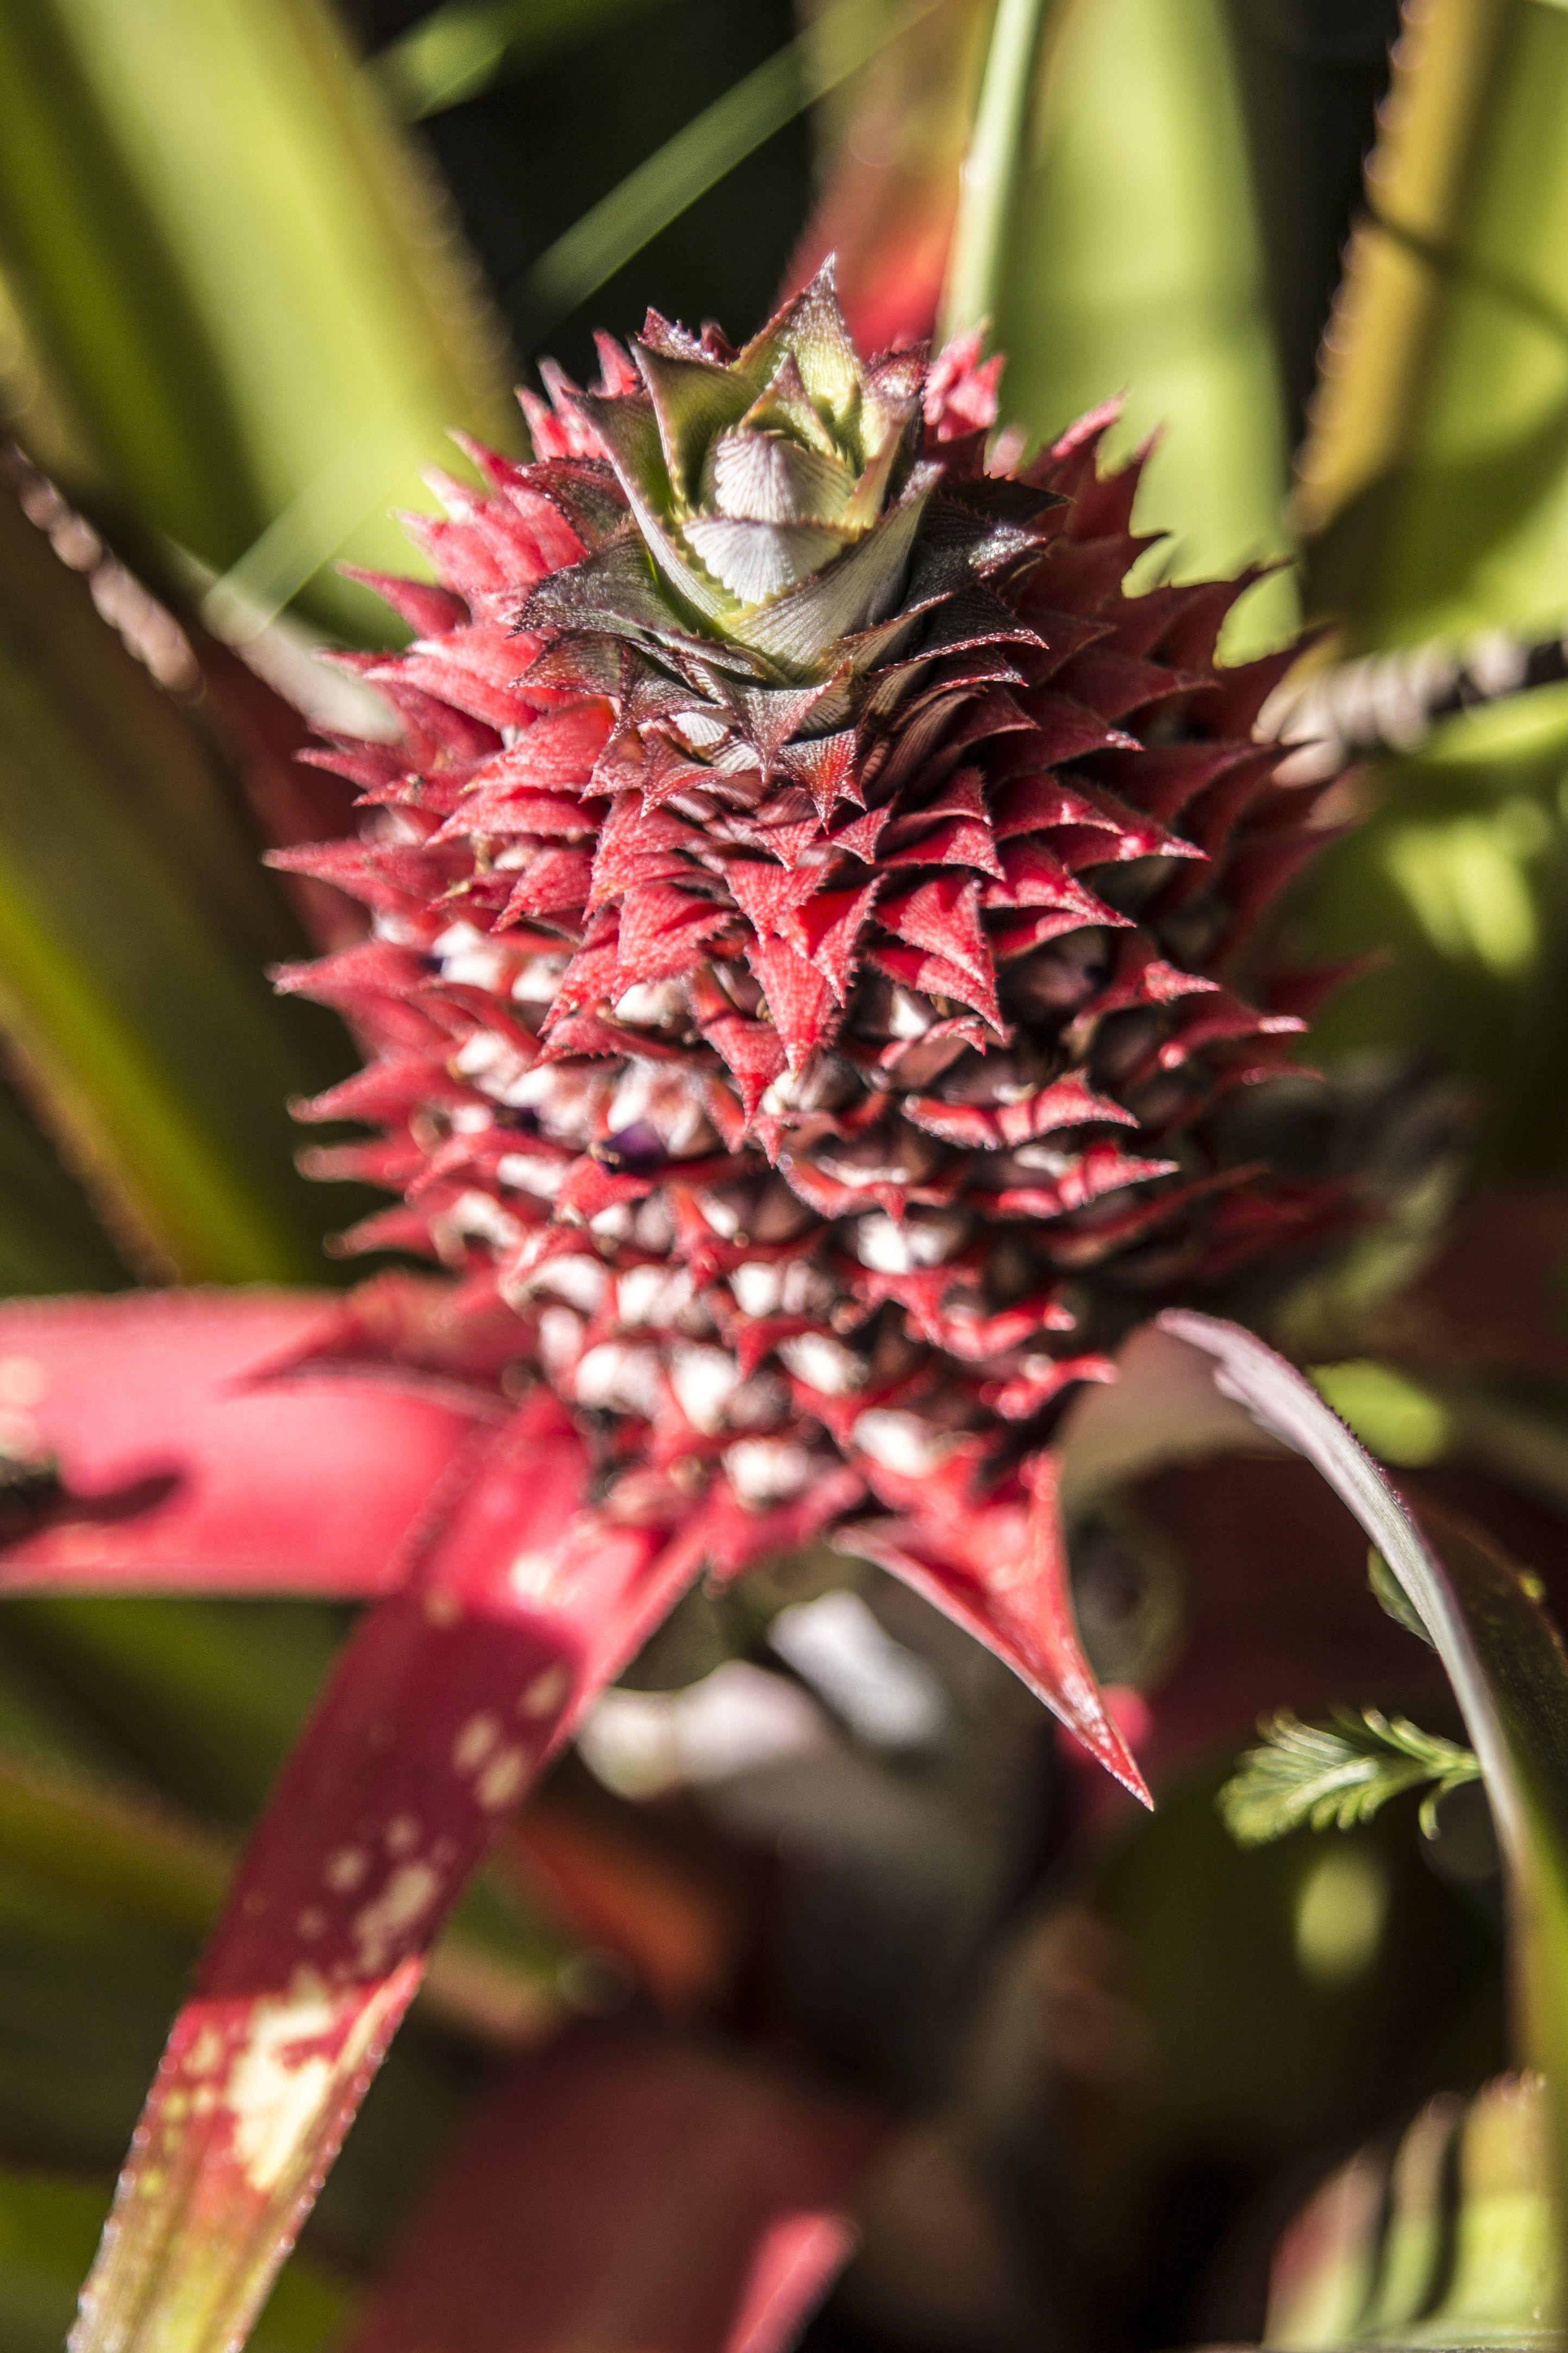 Pineapple Grown On Guam Eat Local Growing Pineapple Healthy